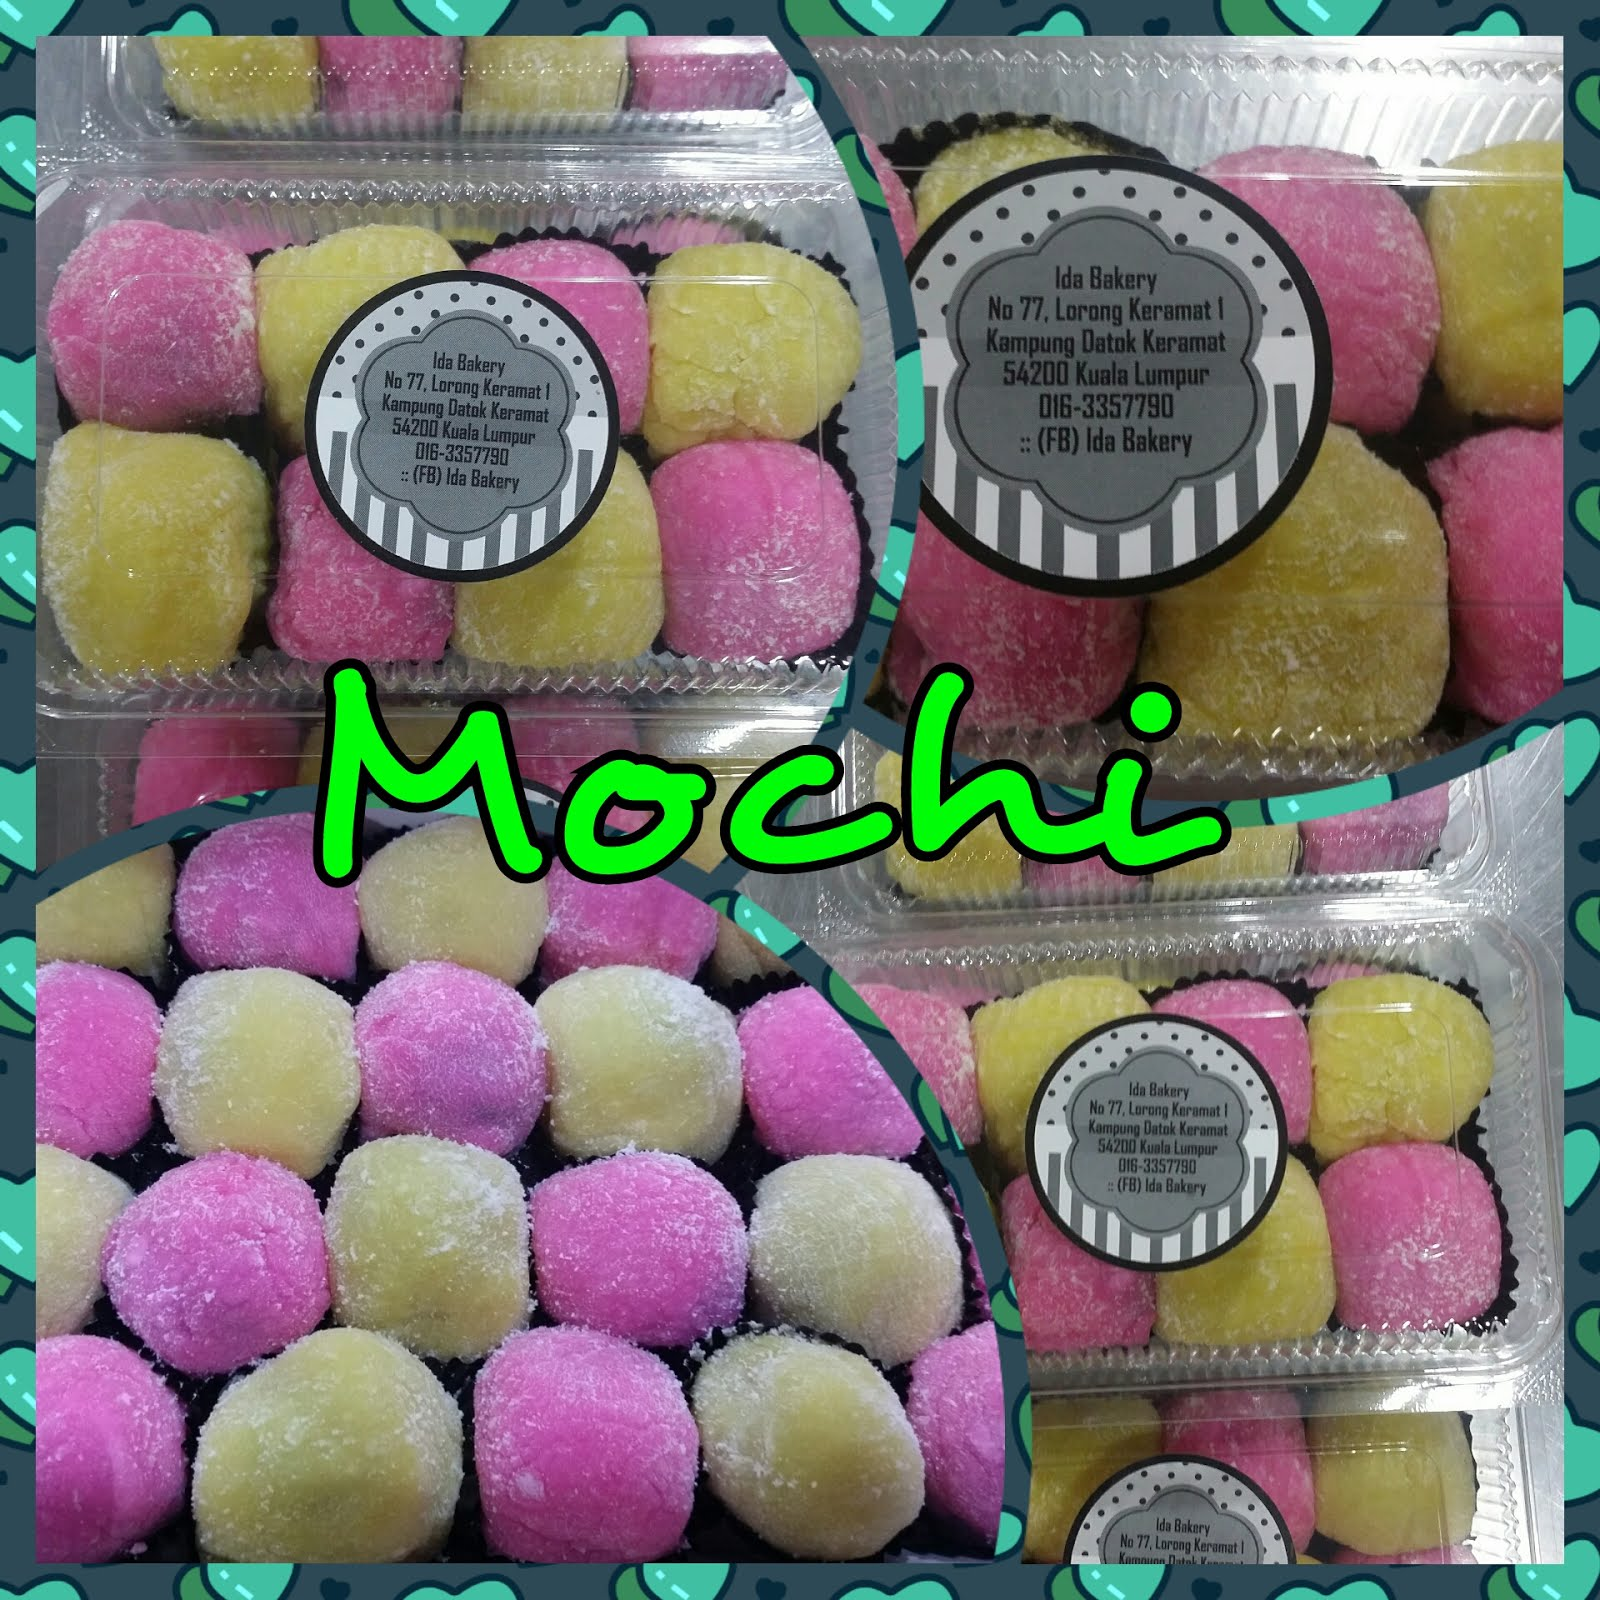 Kelas Homemade Mochi RM180